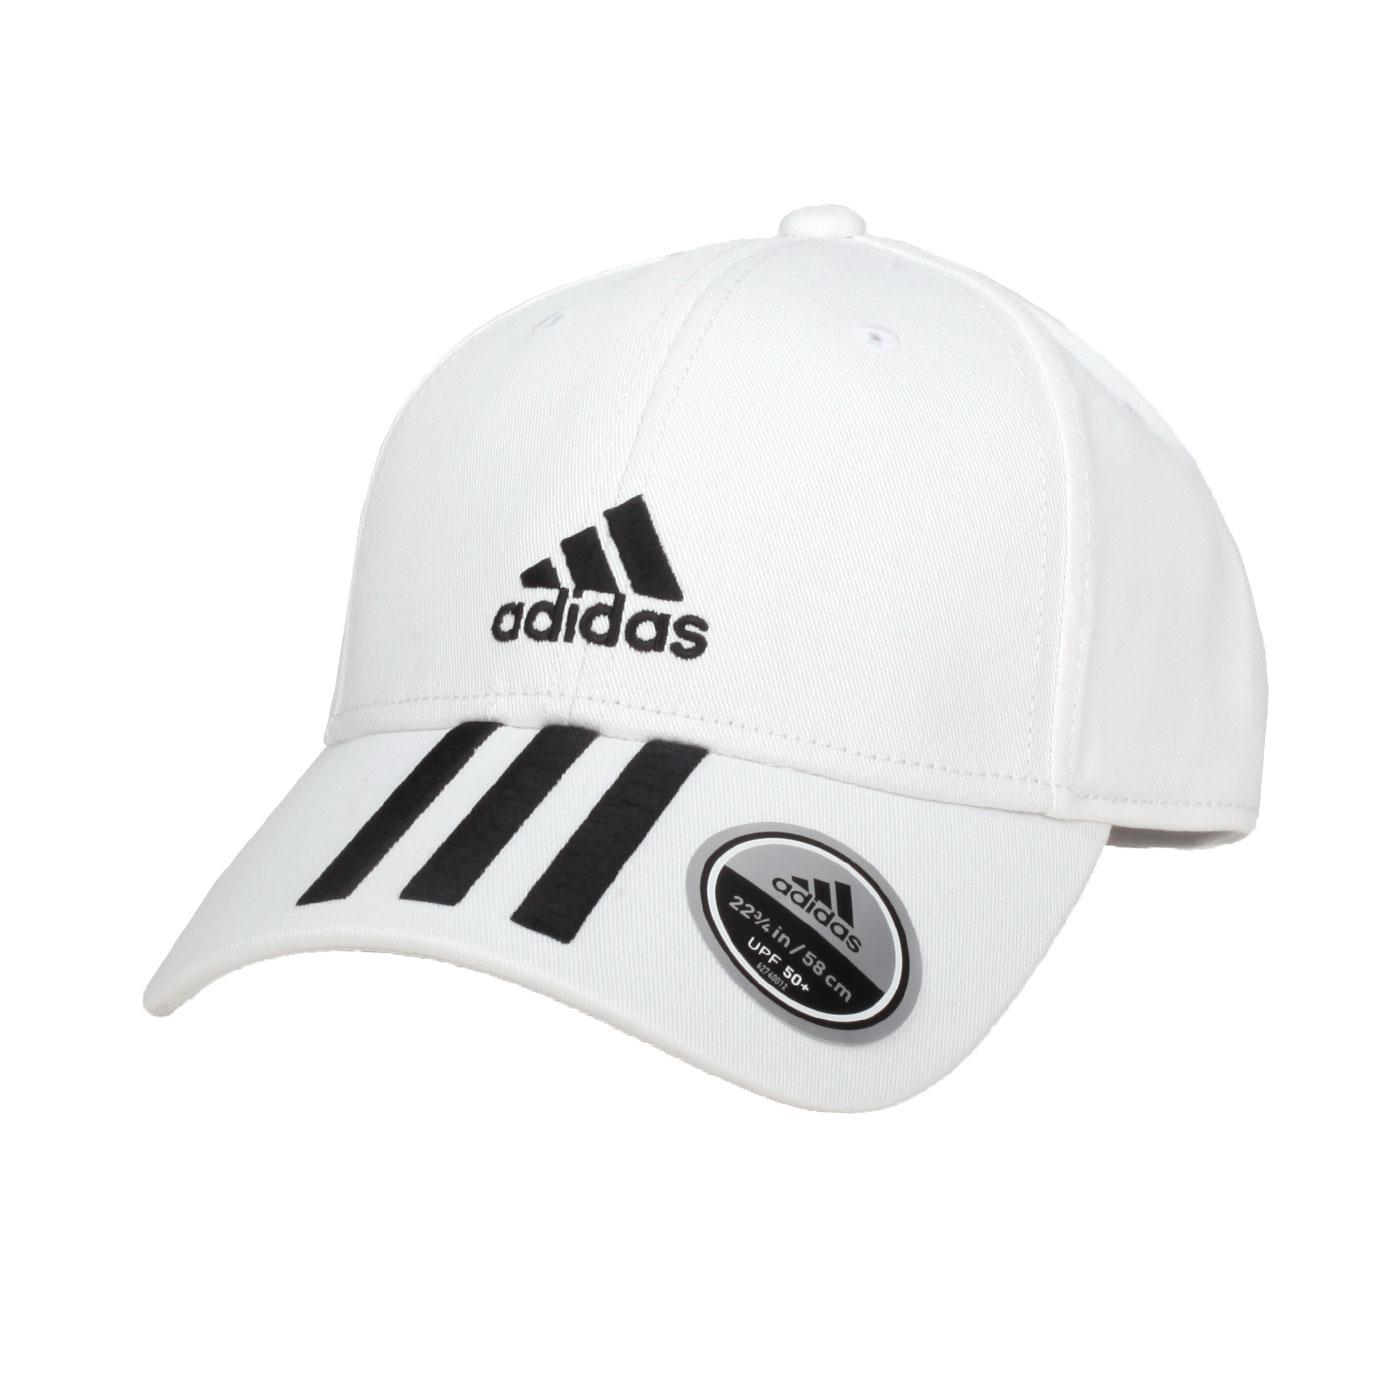 ADIDAS 運動帽 FK0894 - 白黑